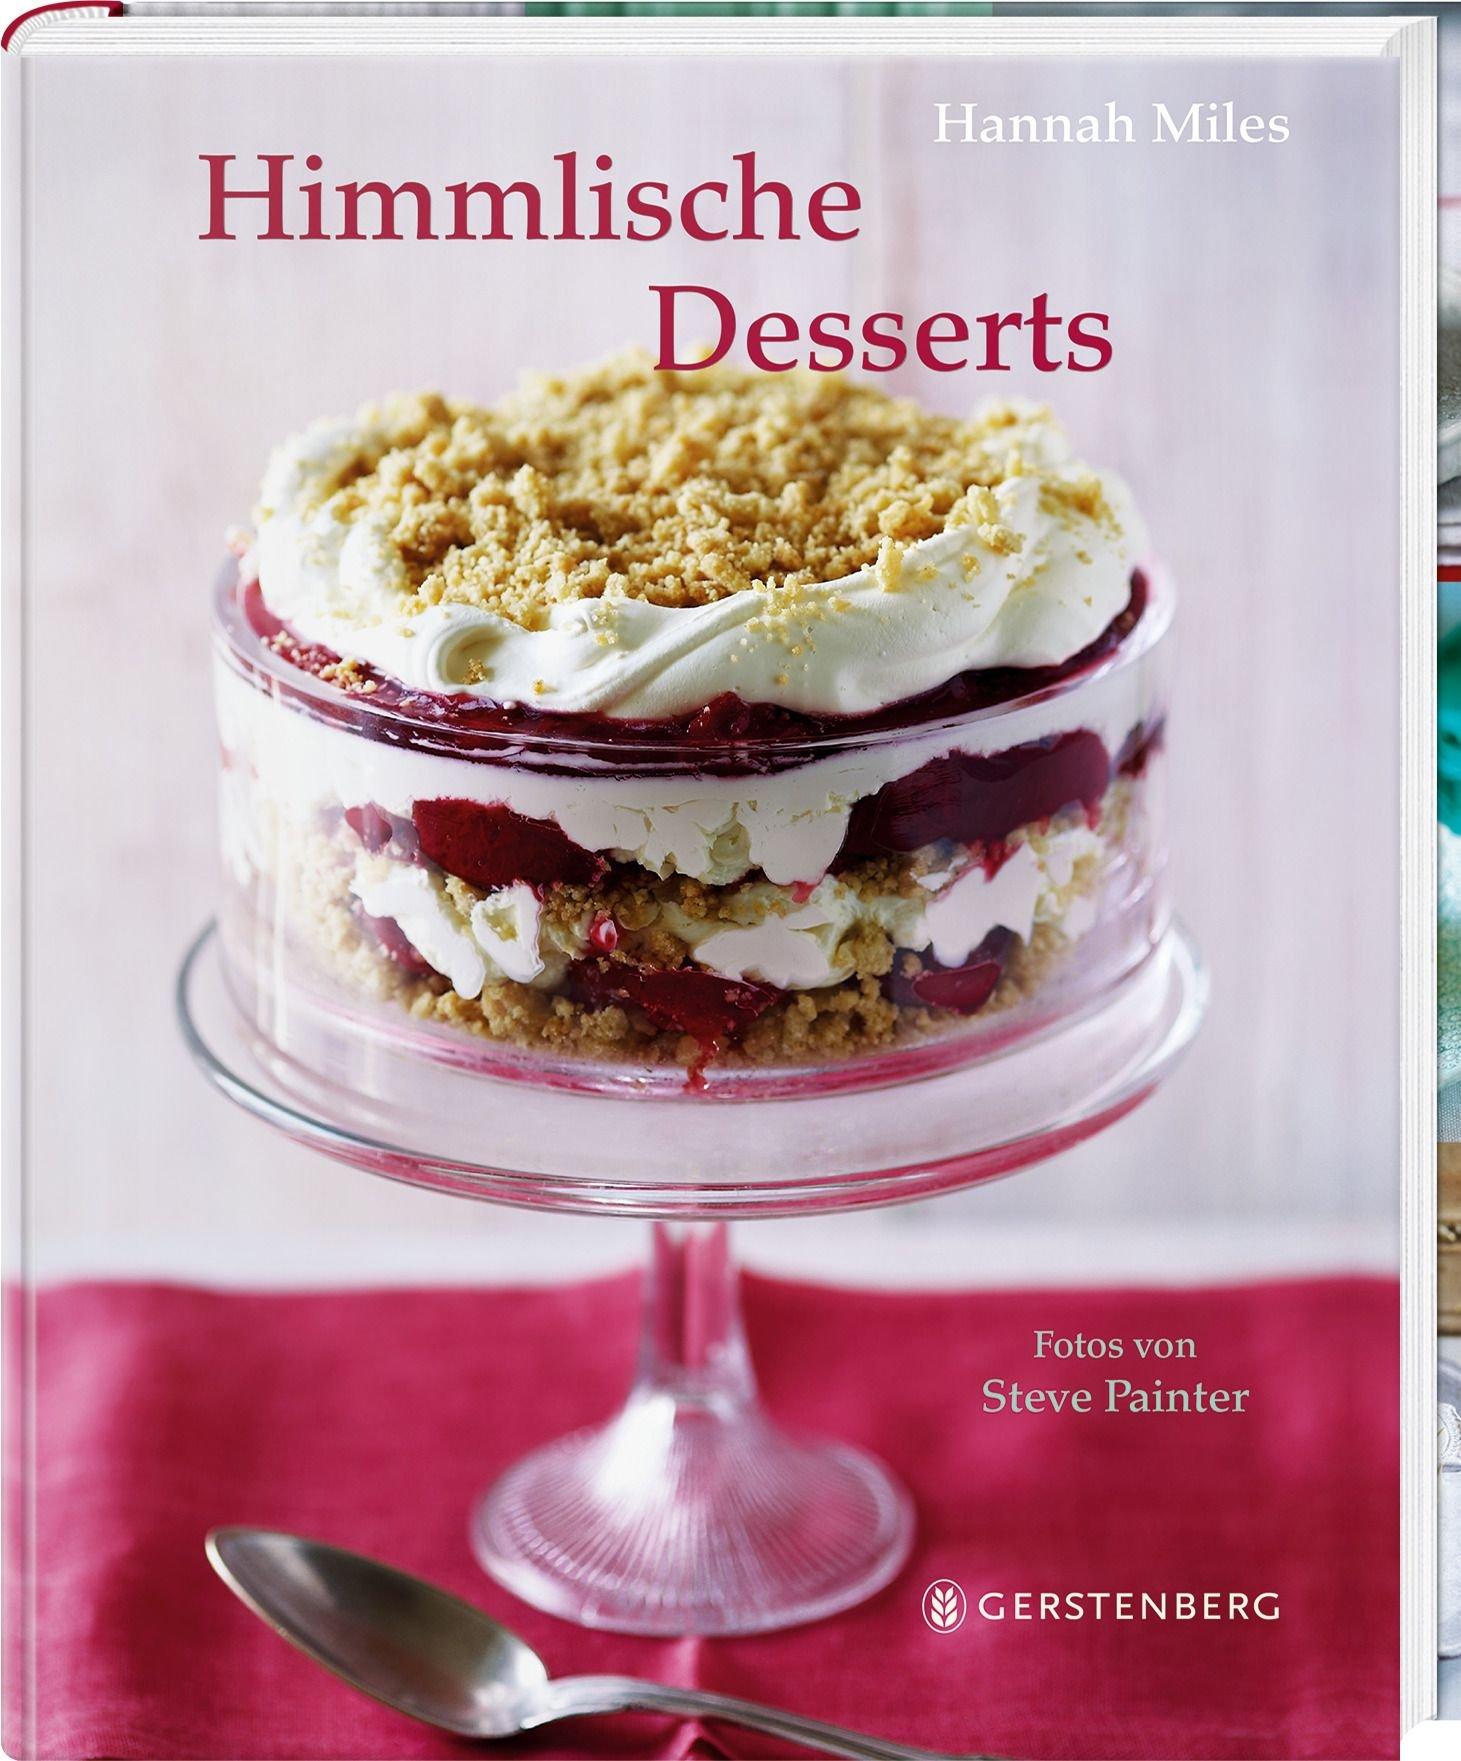 Himmlische Desserts: Amazon.es: Hannah Miles, Steve Painter